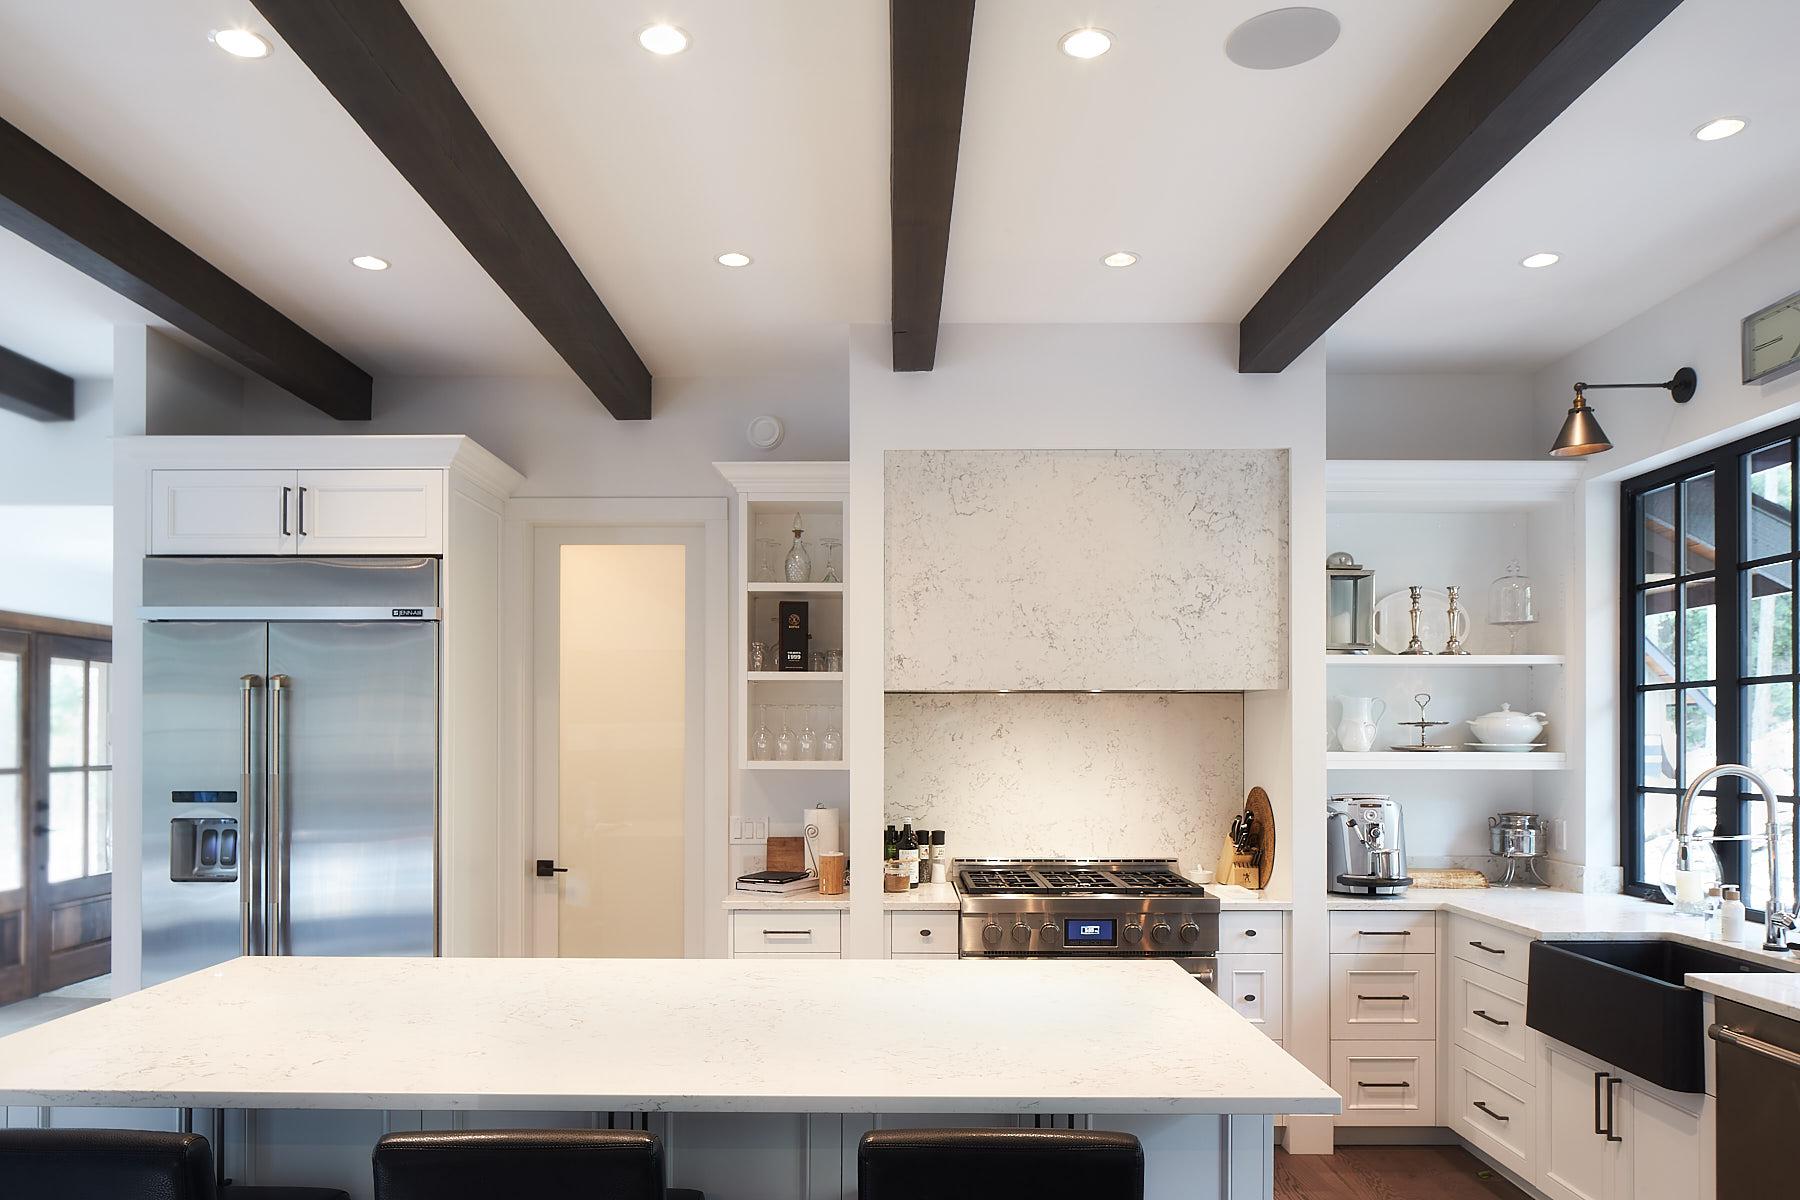 New Construction (builder, owner, real estate) ©johncameron.ca